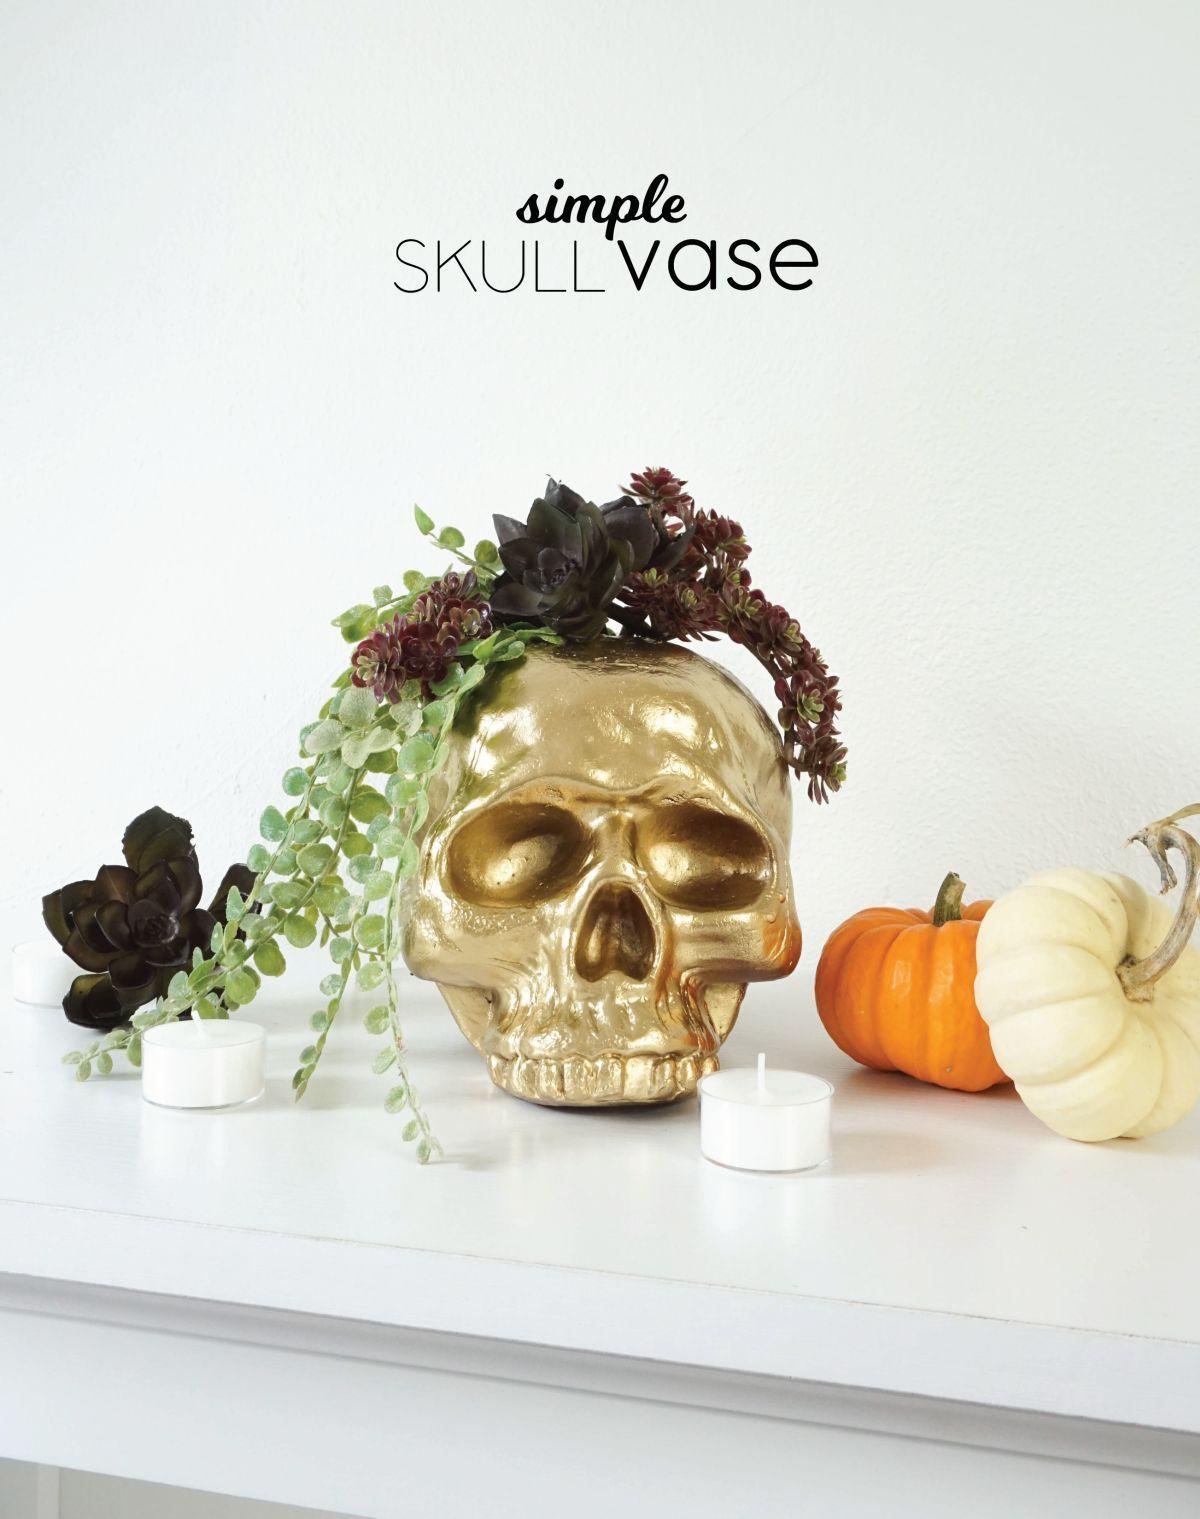 20 Super Scary Halloween Decorations Pinterest Scary halloween - diy halloween decorations scary